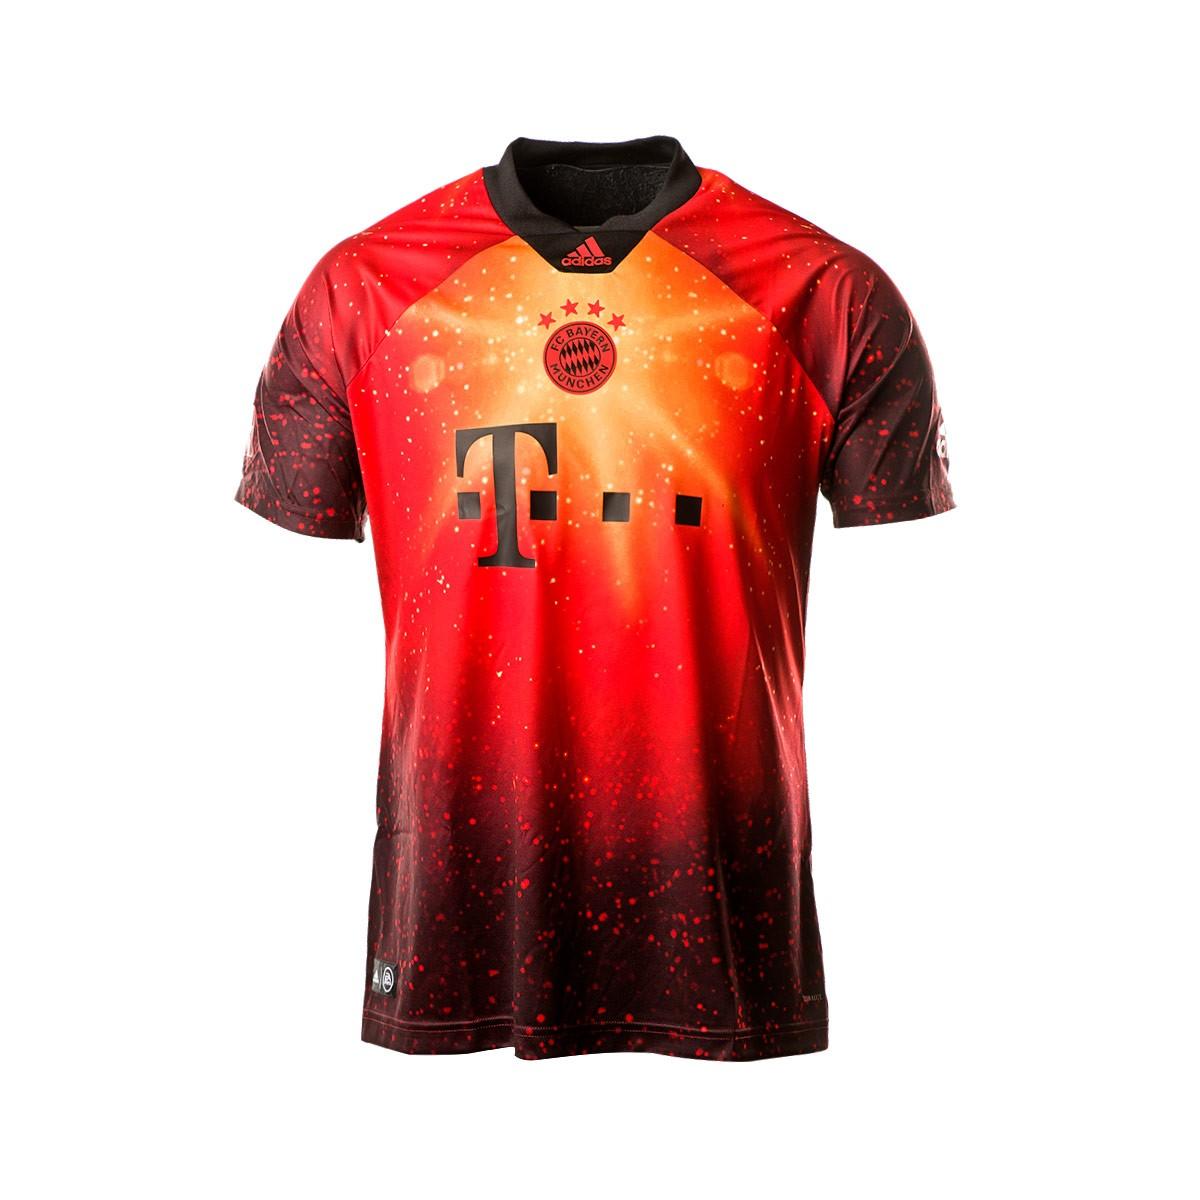 huge discount 556d9 a4e8b Camiseta FC Bayern EA 2018-2019 Multicolor-Black